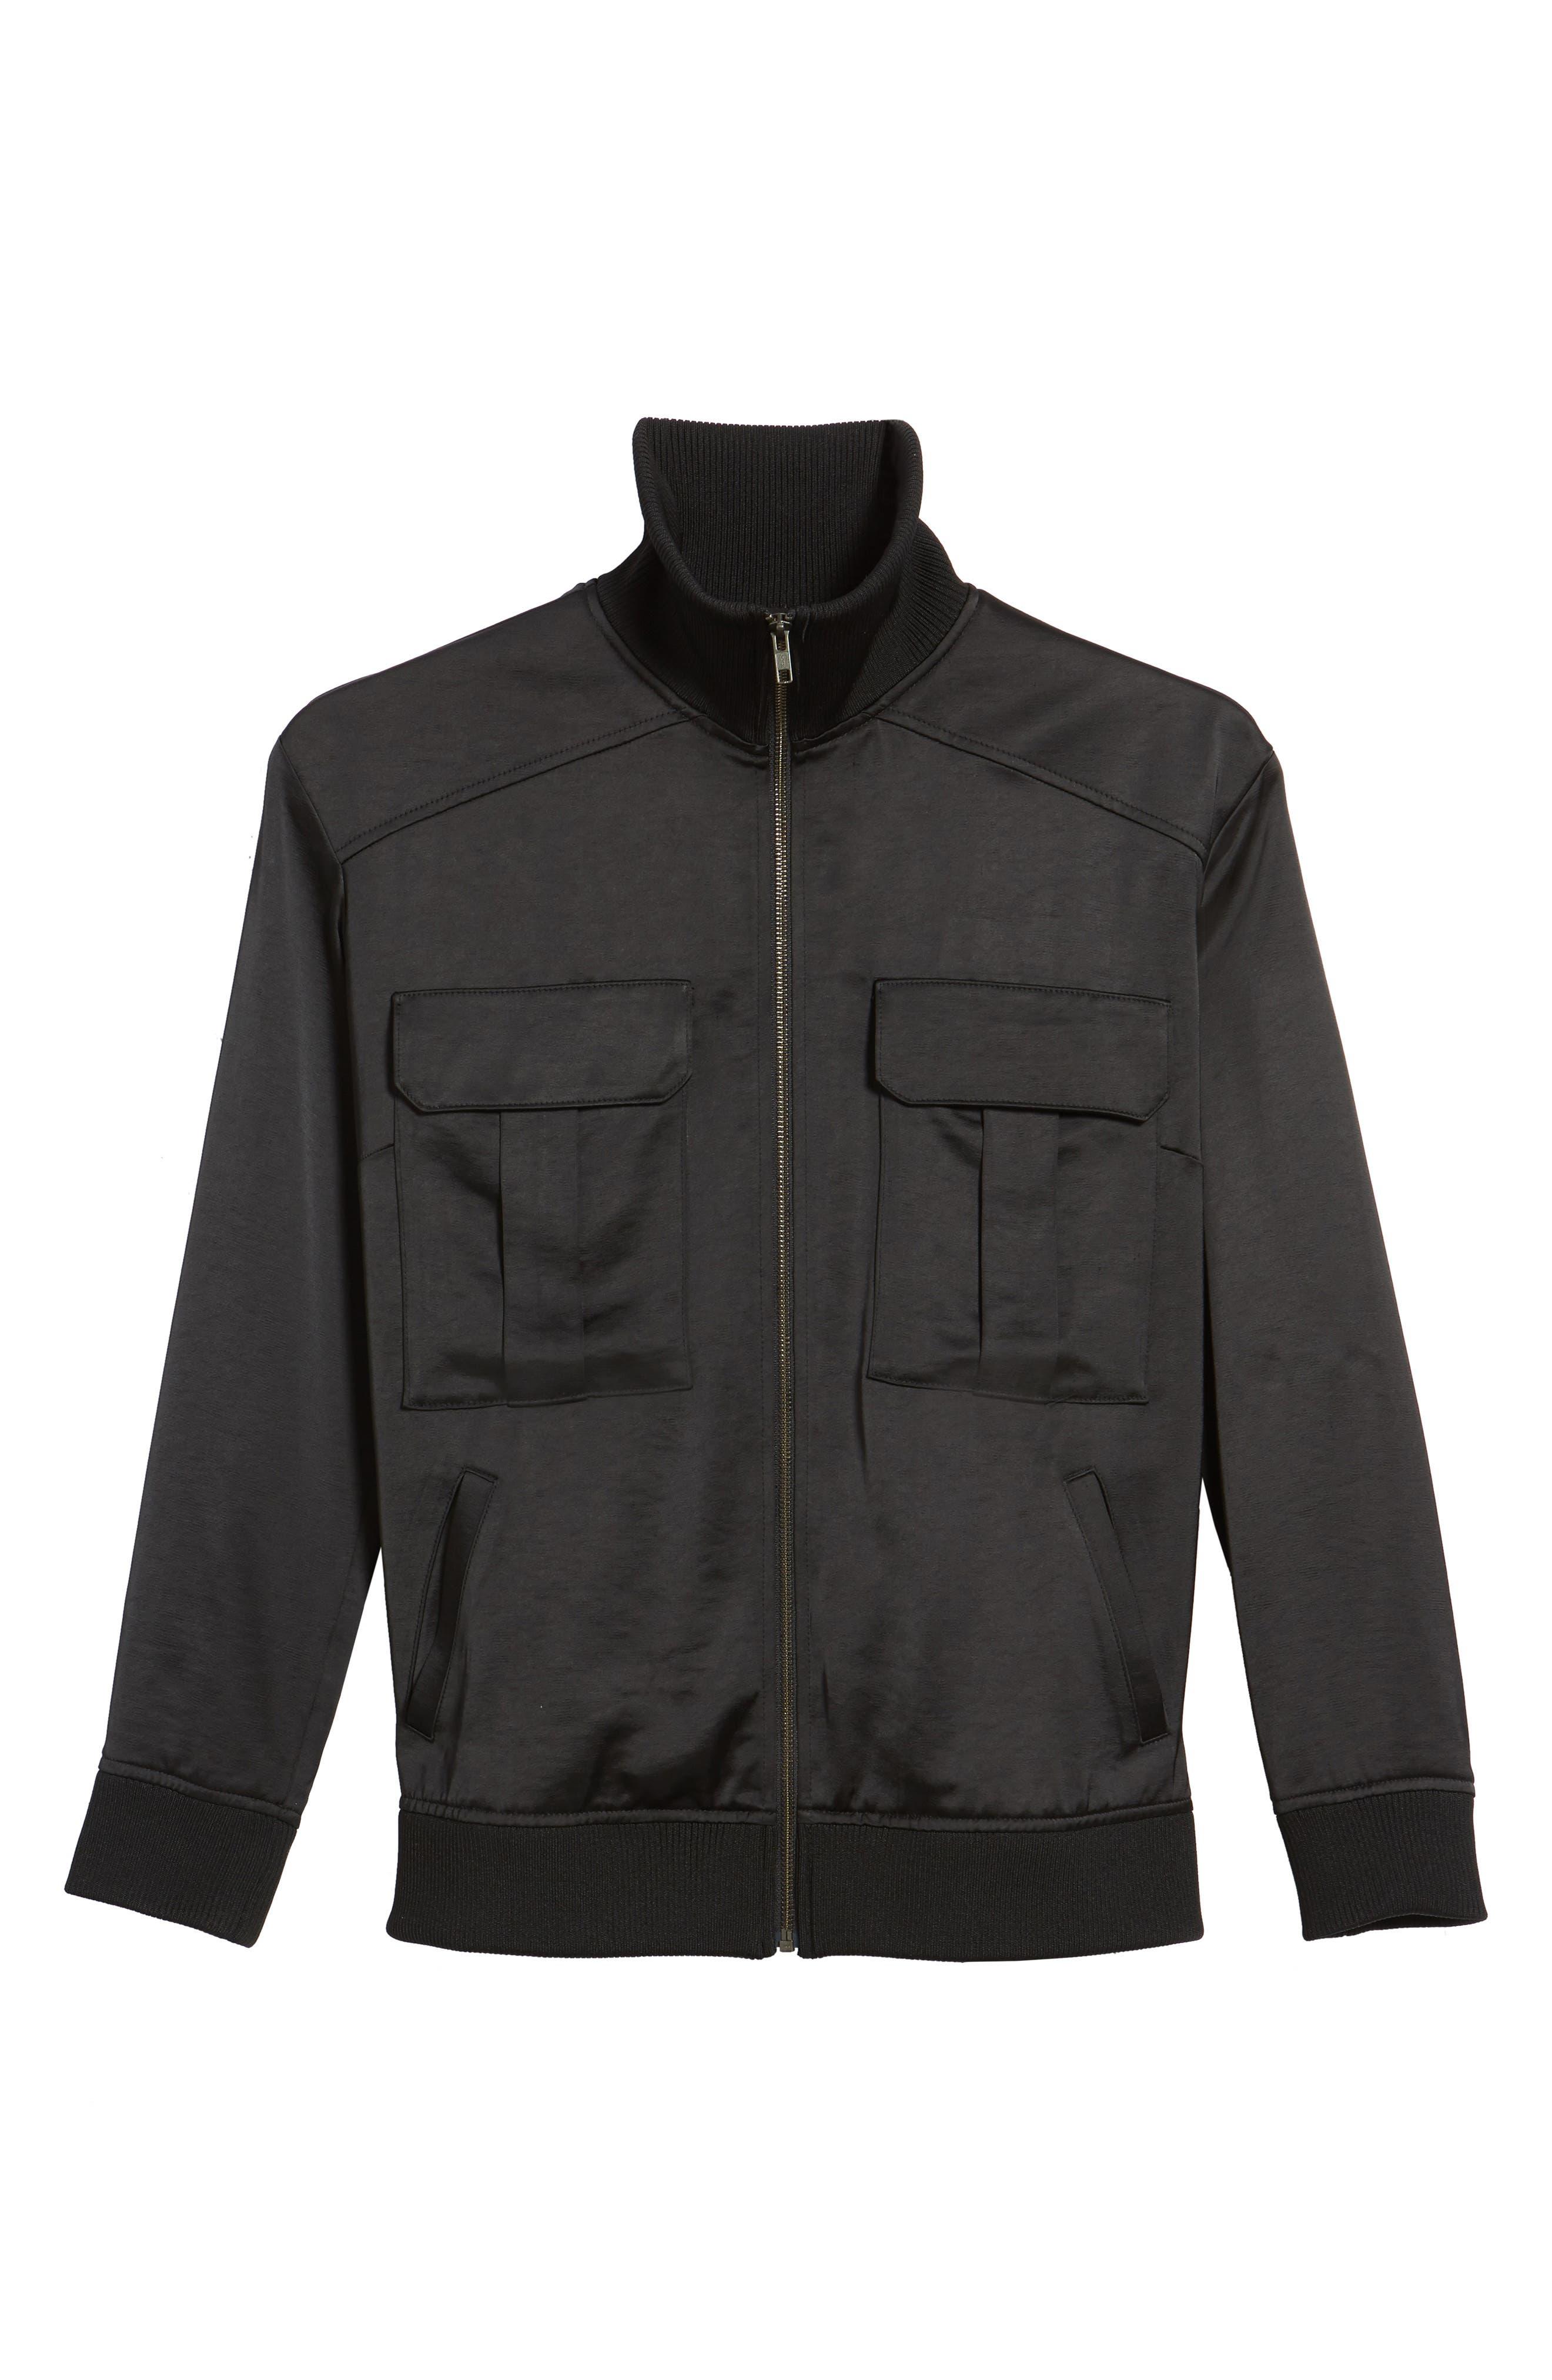 Satin Track Jacket,                             Alternate thumbnail 6, color,                             Black